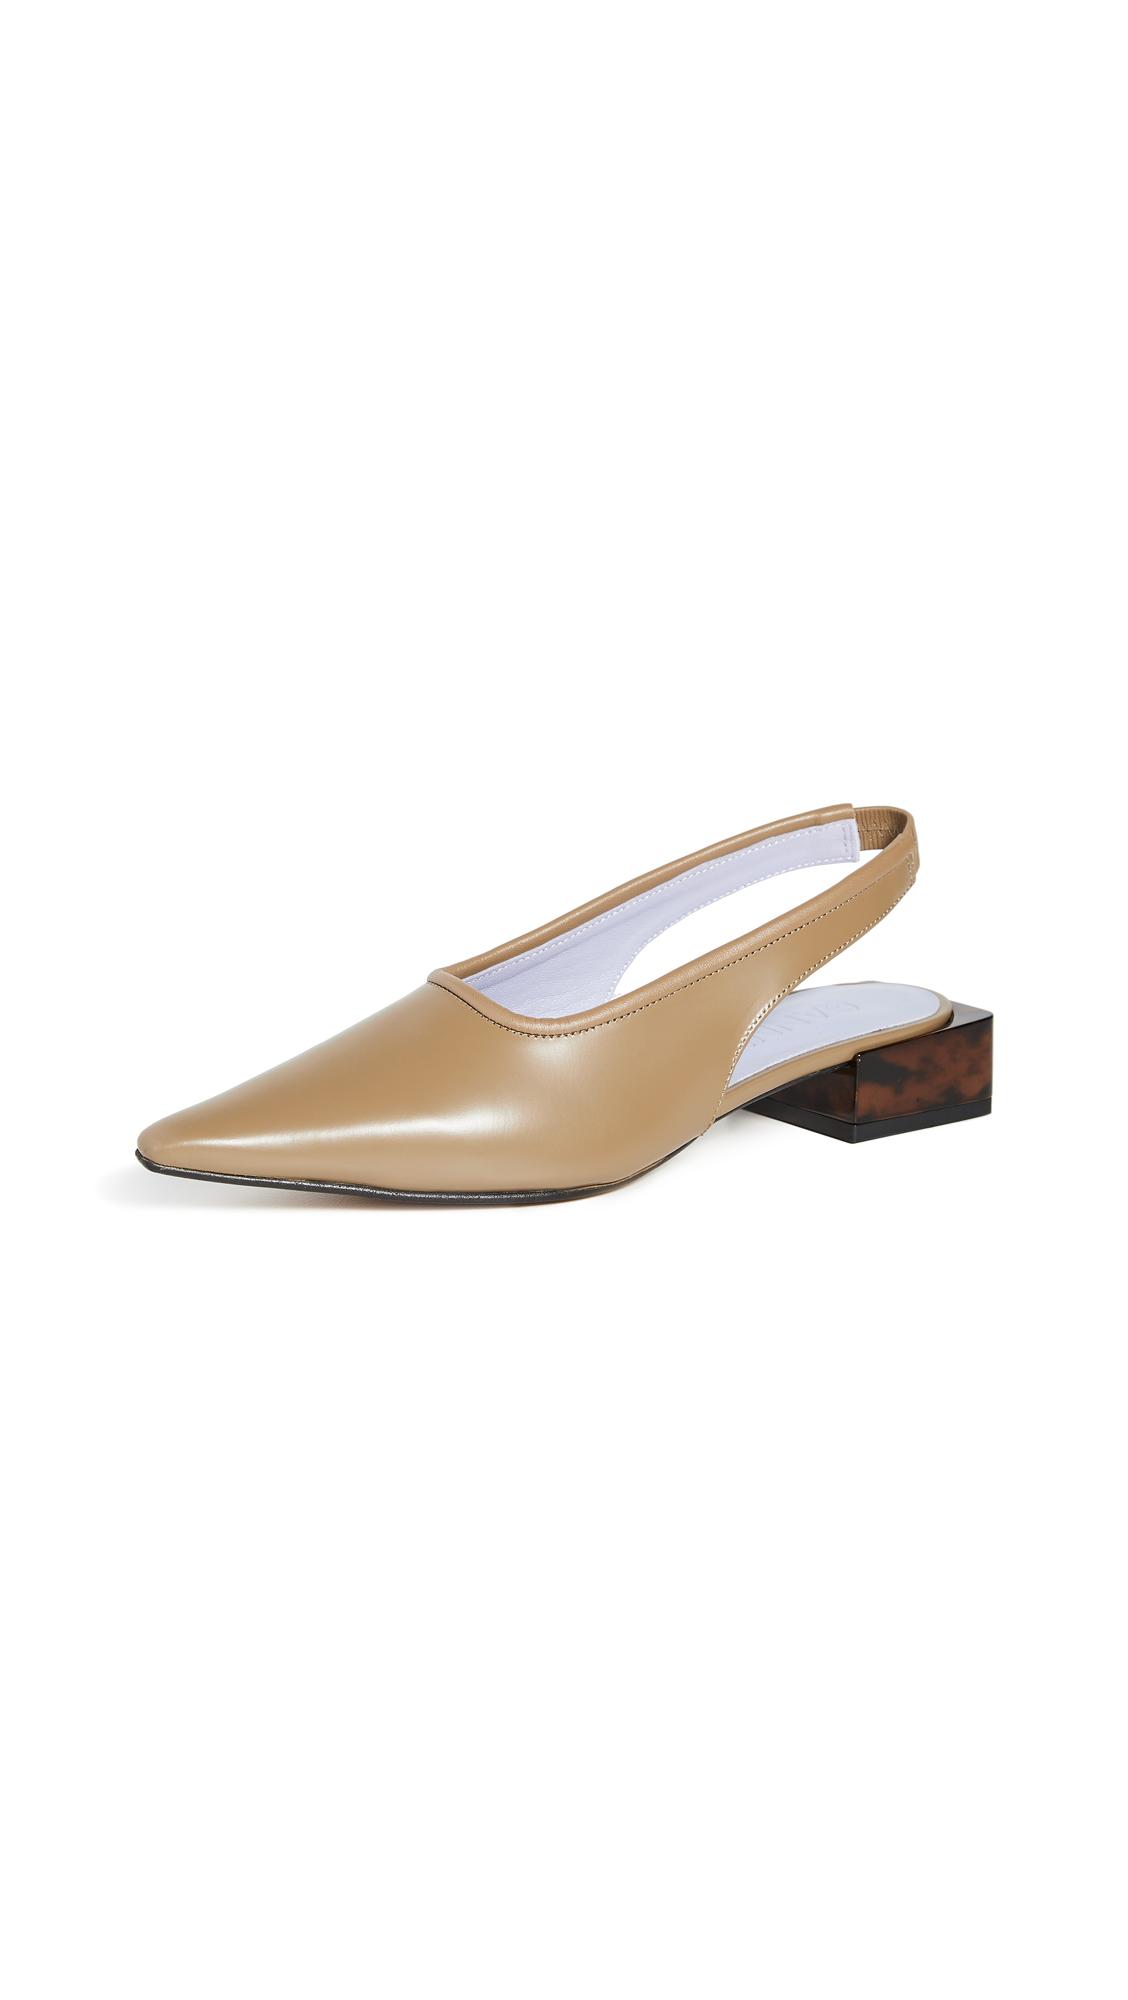 Buy GANNI Low Heel Slingback Flats online, shop GANNI